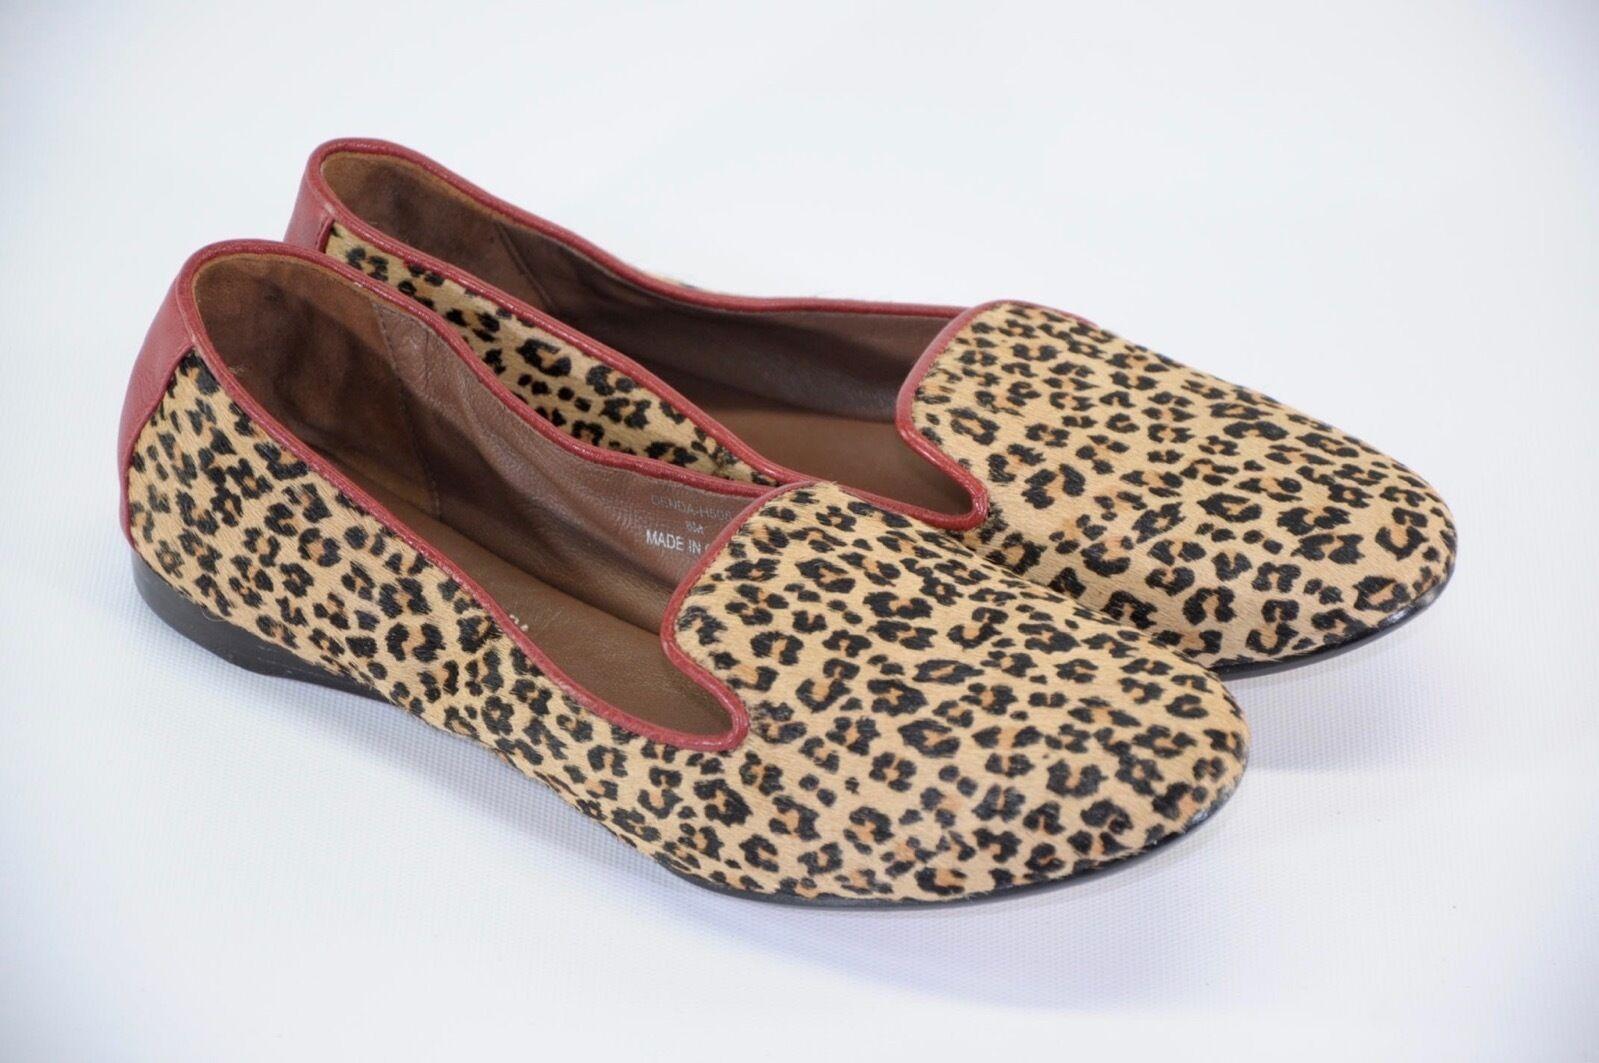 Donald J. Pliner Denda Leopard Print Red Leather Pony Calf Hair Flats Loafers 8M